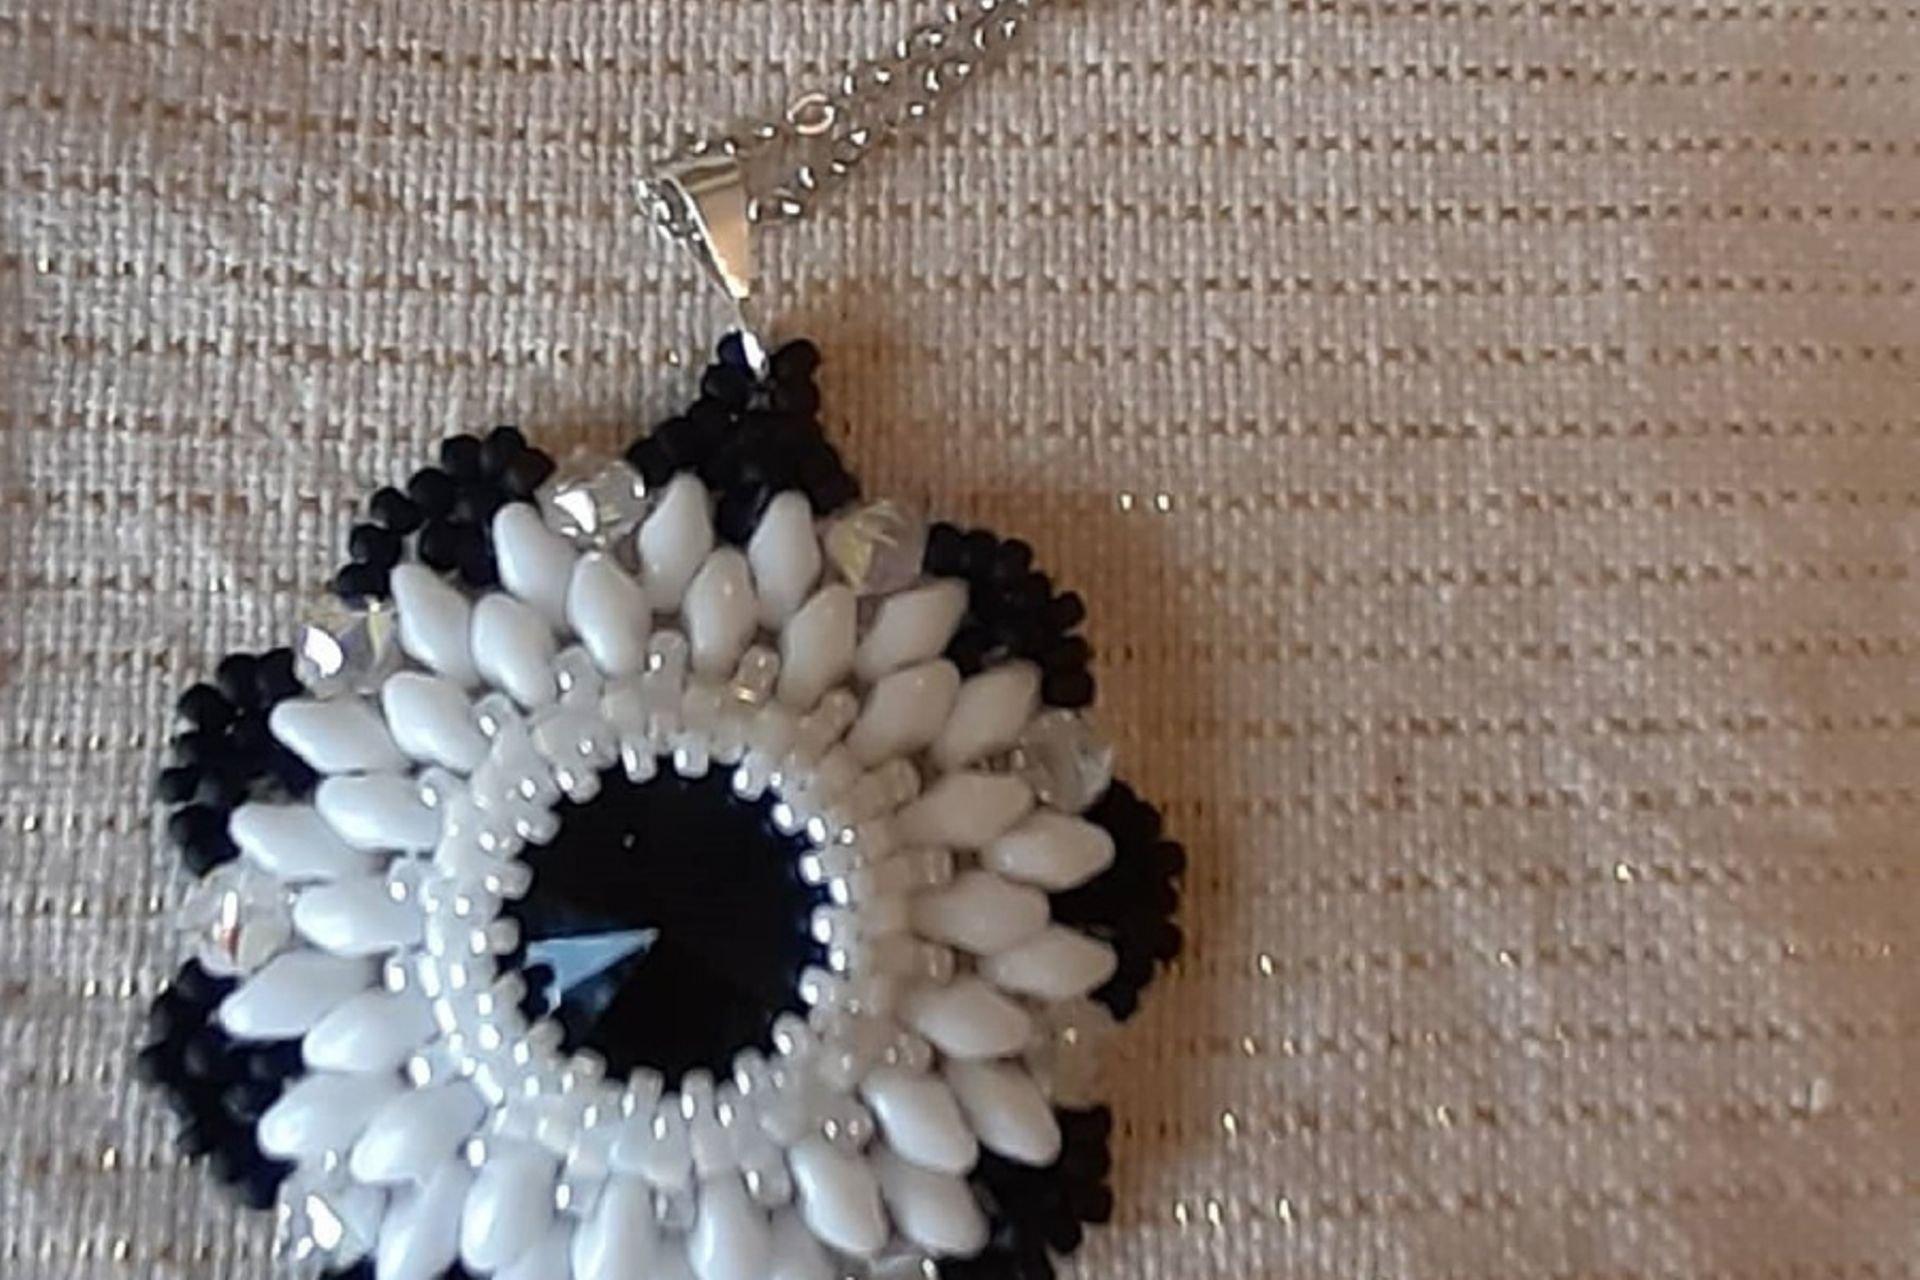 26 lantana beads jewelry designer תְמוּנָה